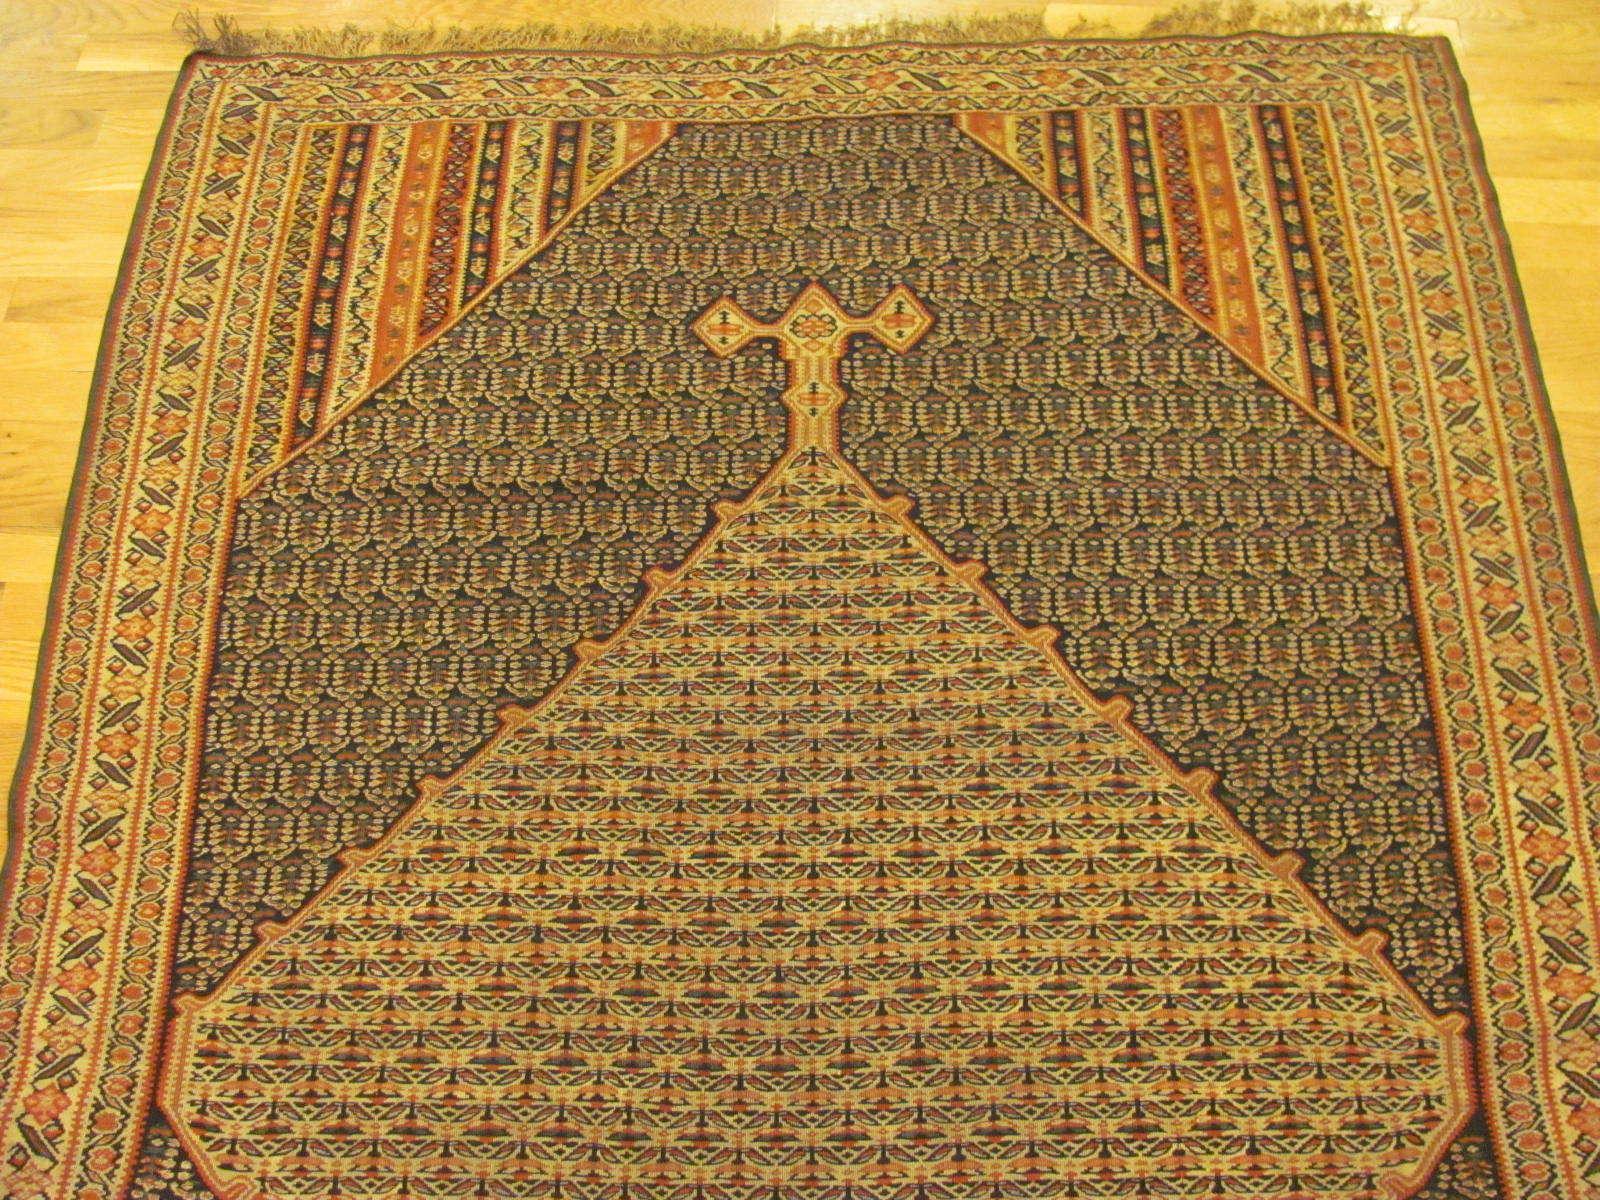 24874 antique persian senneh kilim rug 4,4x6,11-1